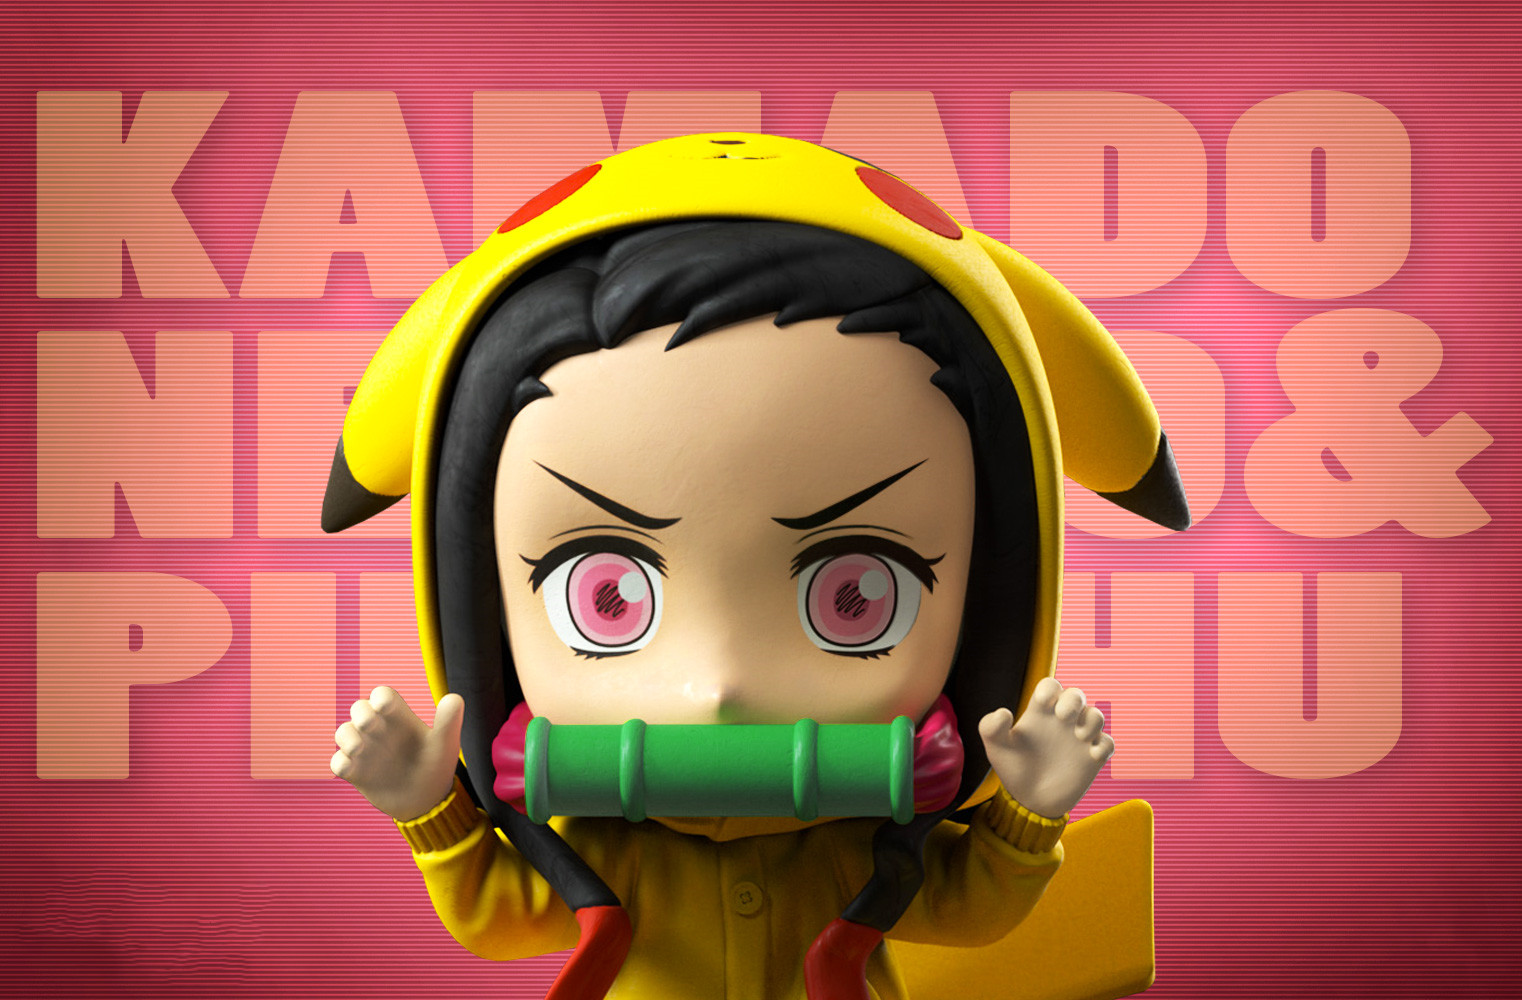 Anime Figure Demon Slayer Kimetsu No Yaiba Kamado Nezuko Cute Toys for Kids Collectible Model PVC Doll